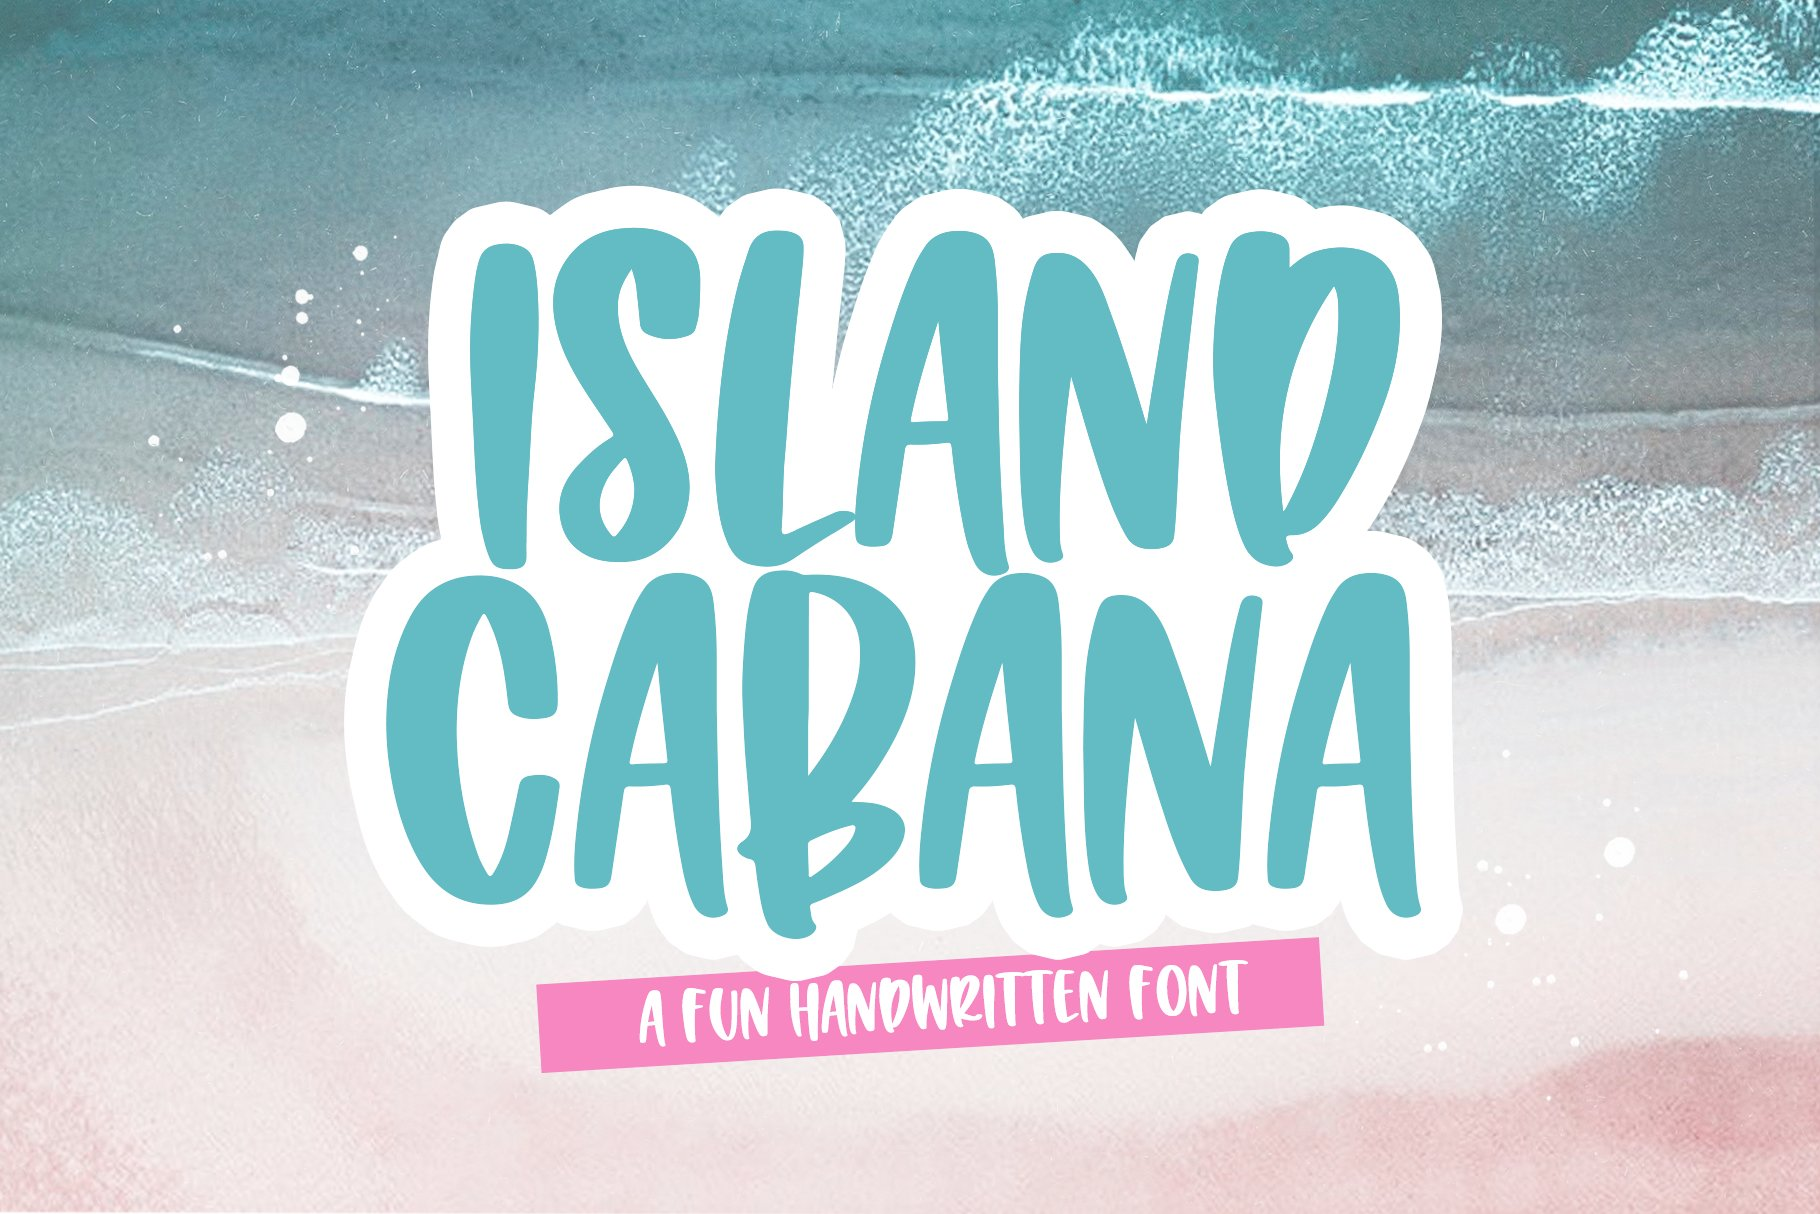 Island Cabana - A Fun Handwritten Font example image 1